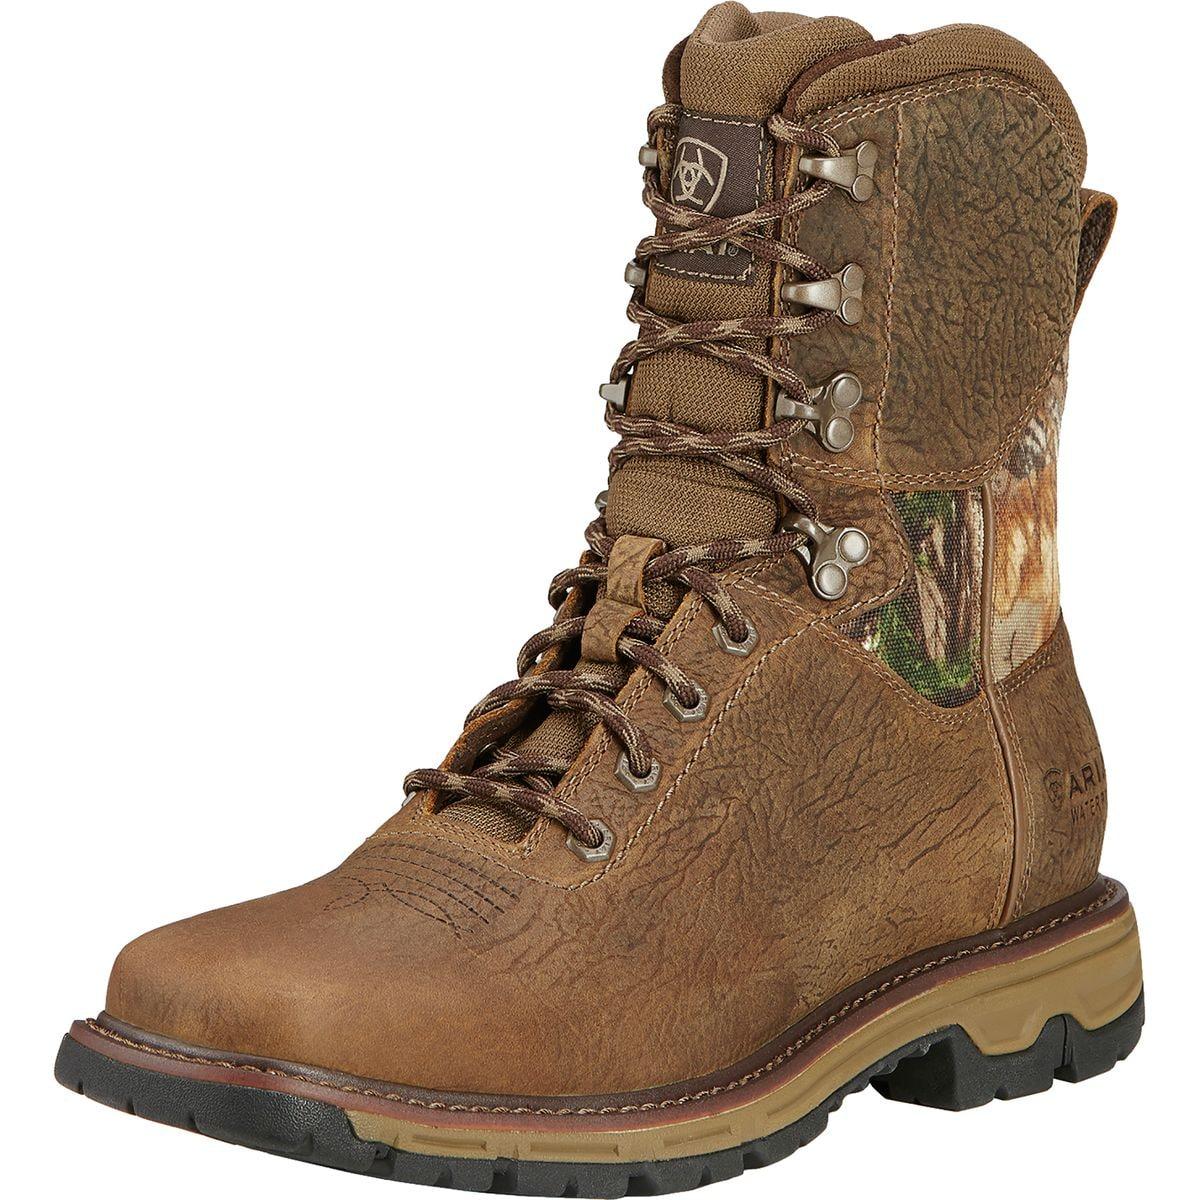 Ariat Conquest 8in H20 Boot - Men's